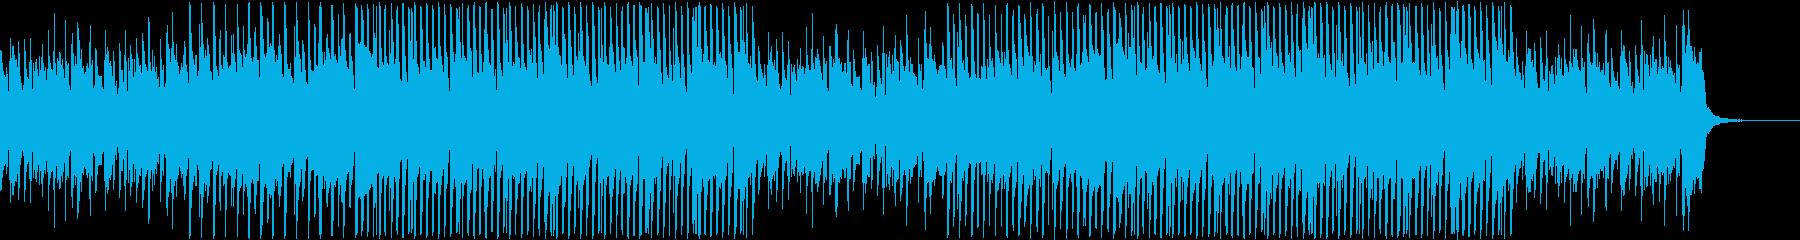 Ukulele Musicの再生済みの波形